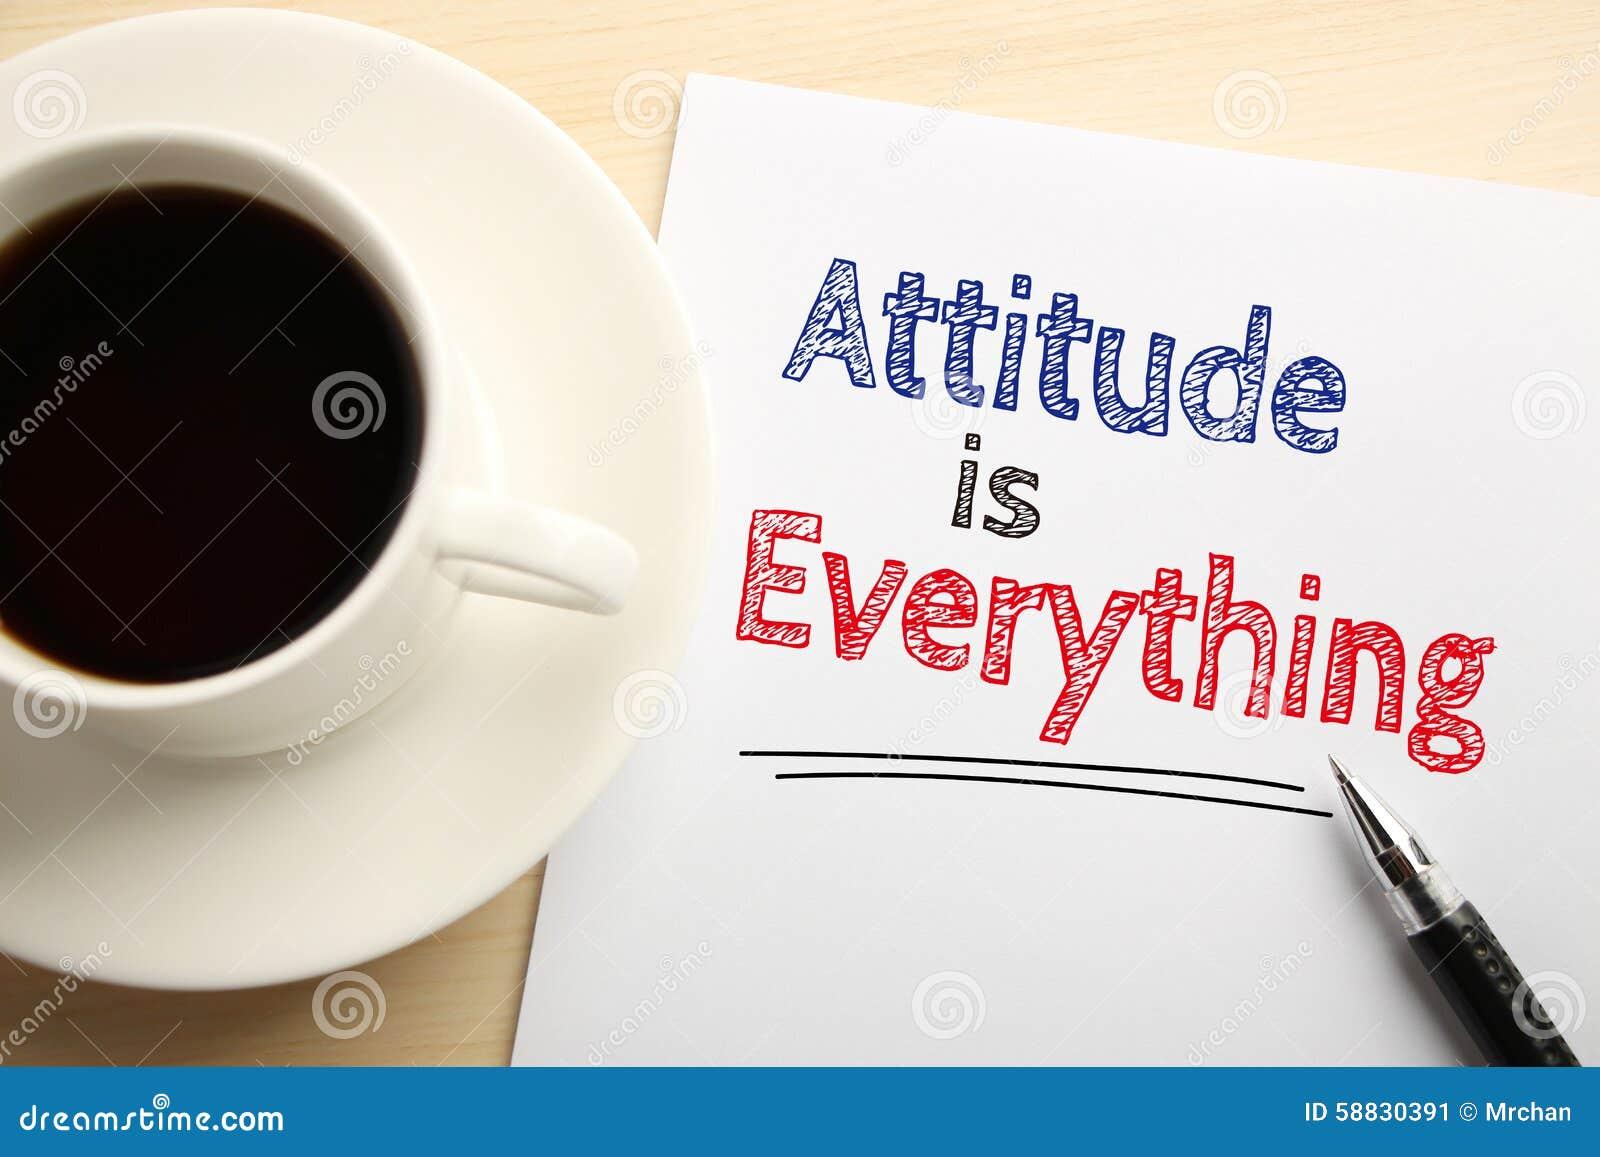 604 words essay on Attitude